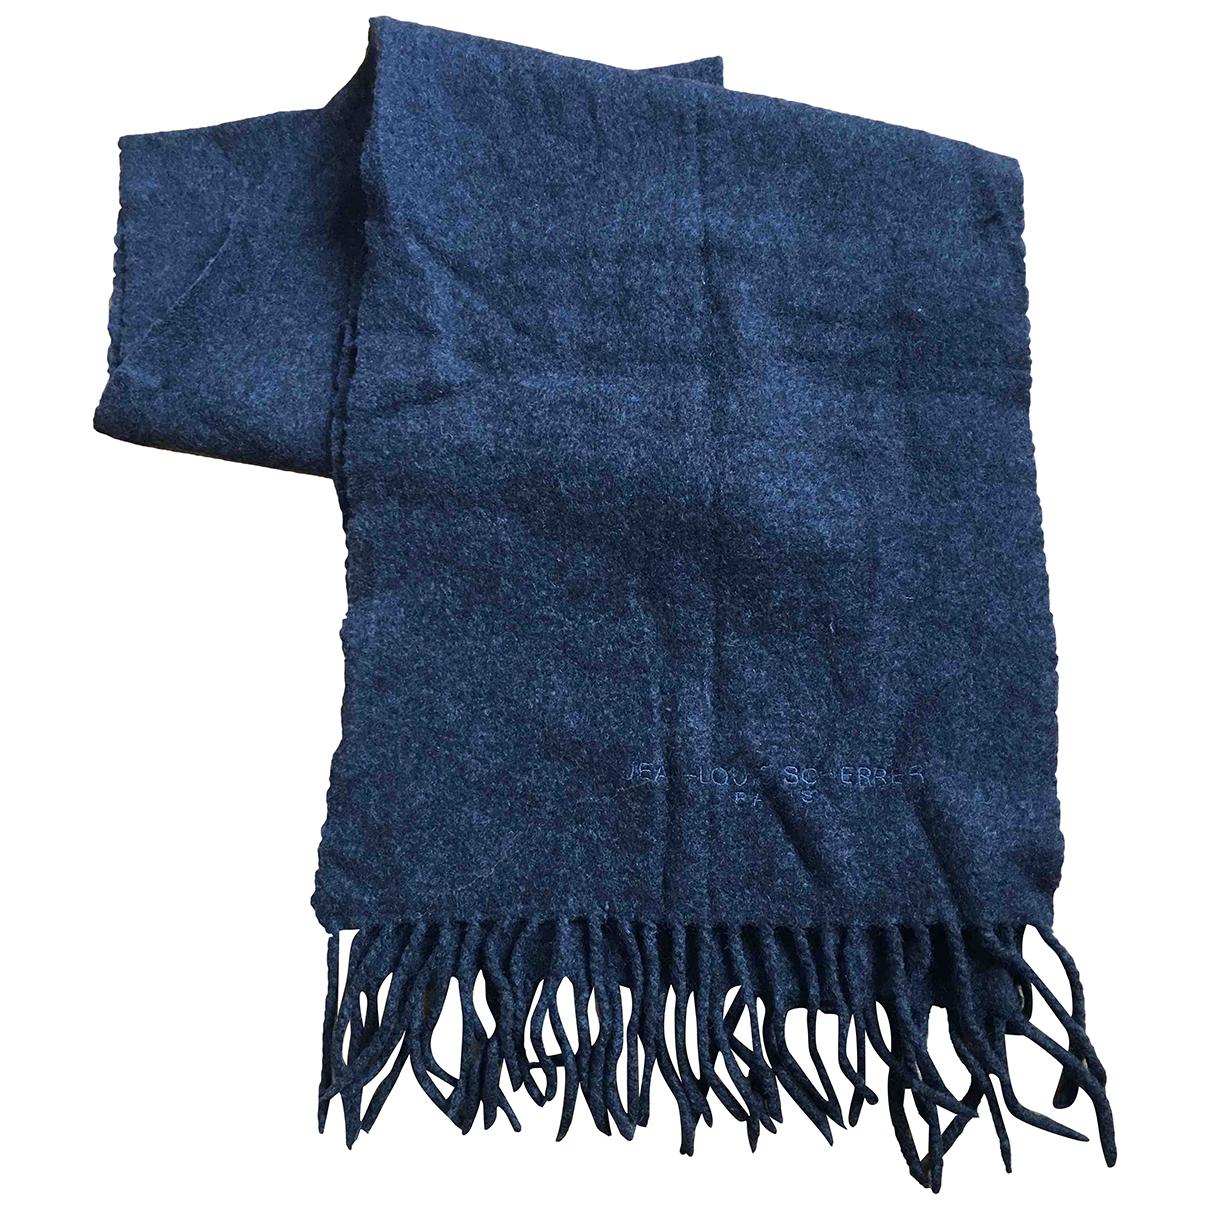 Jean-louis Scherrer N Anthracite Wool scarf & pocket squares for Men N